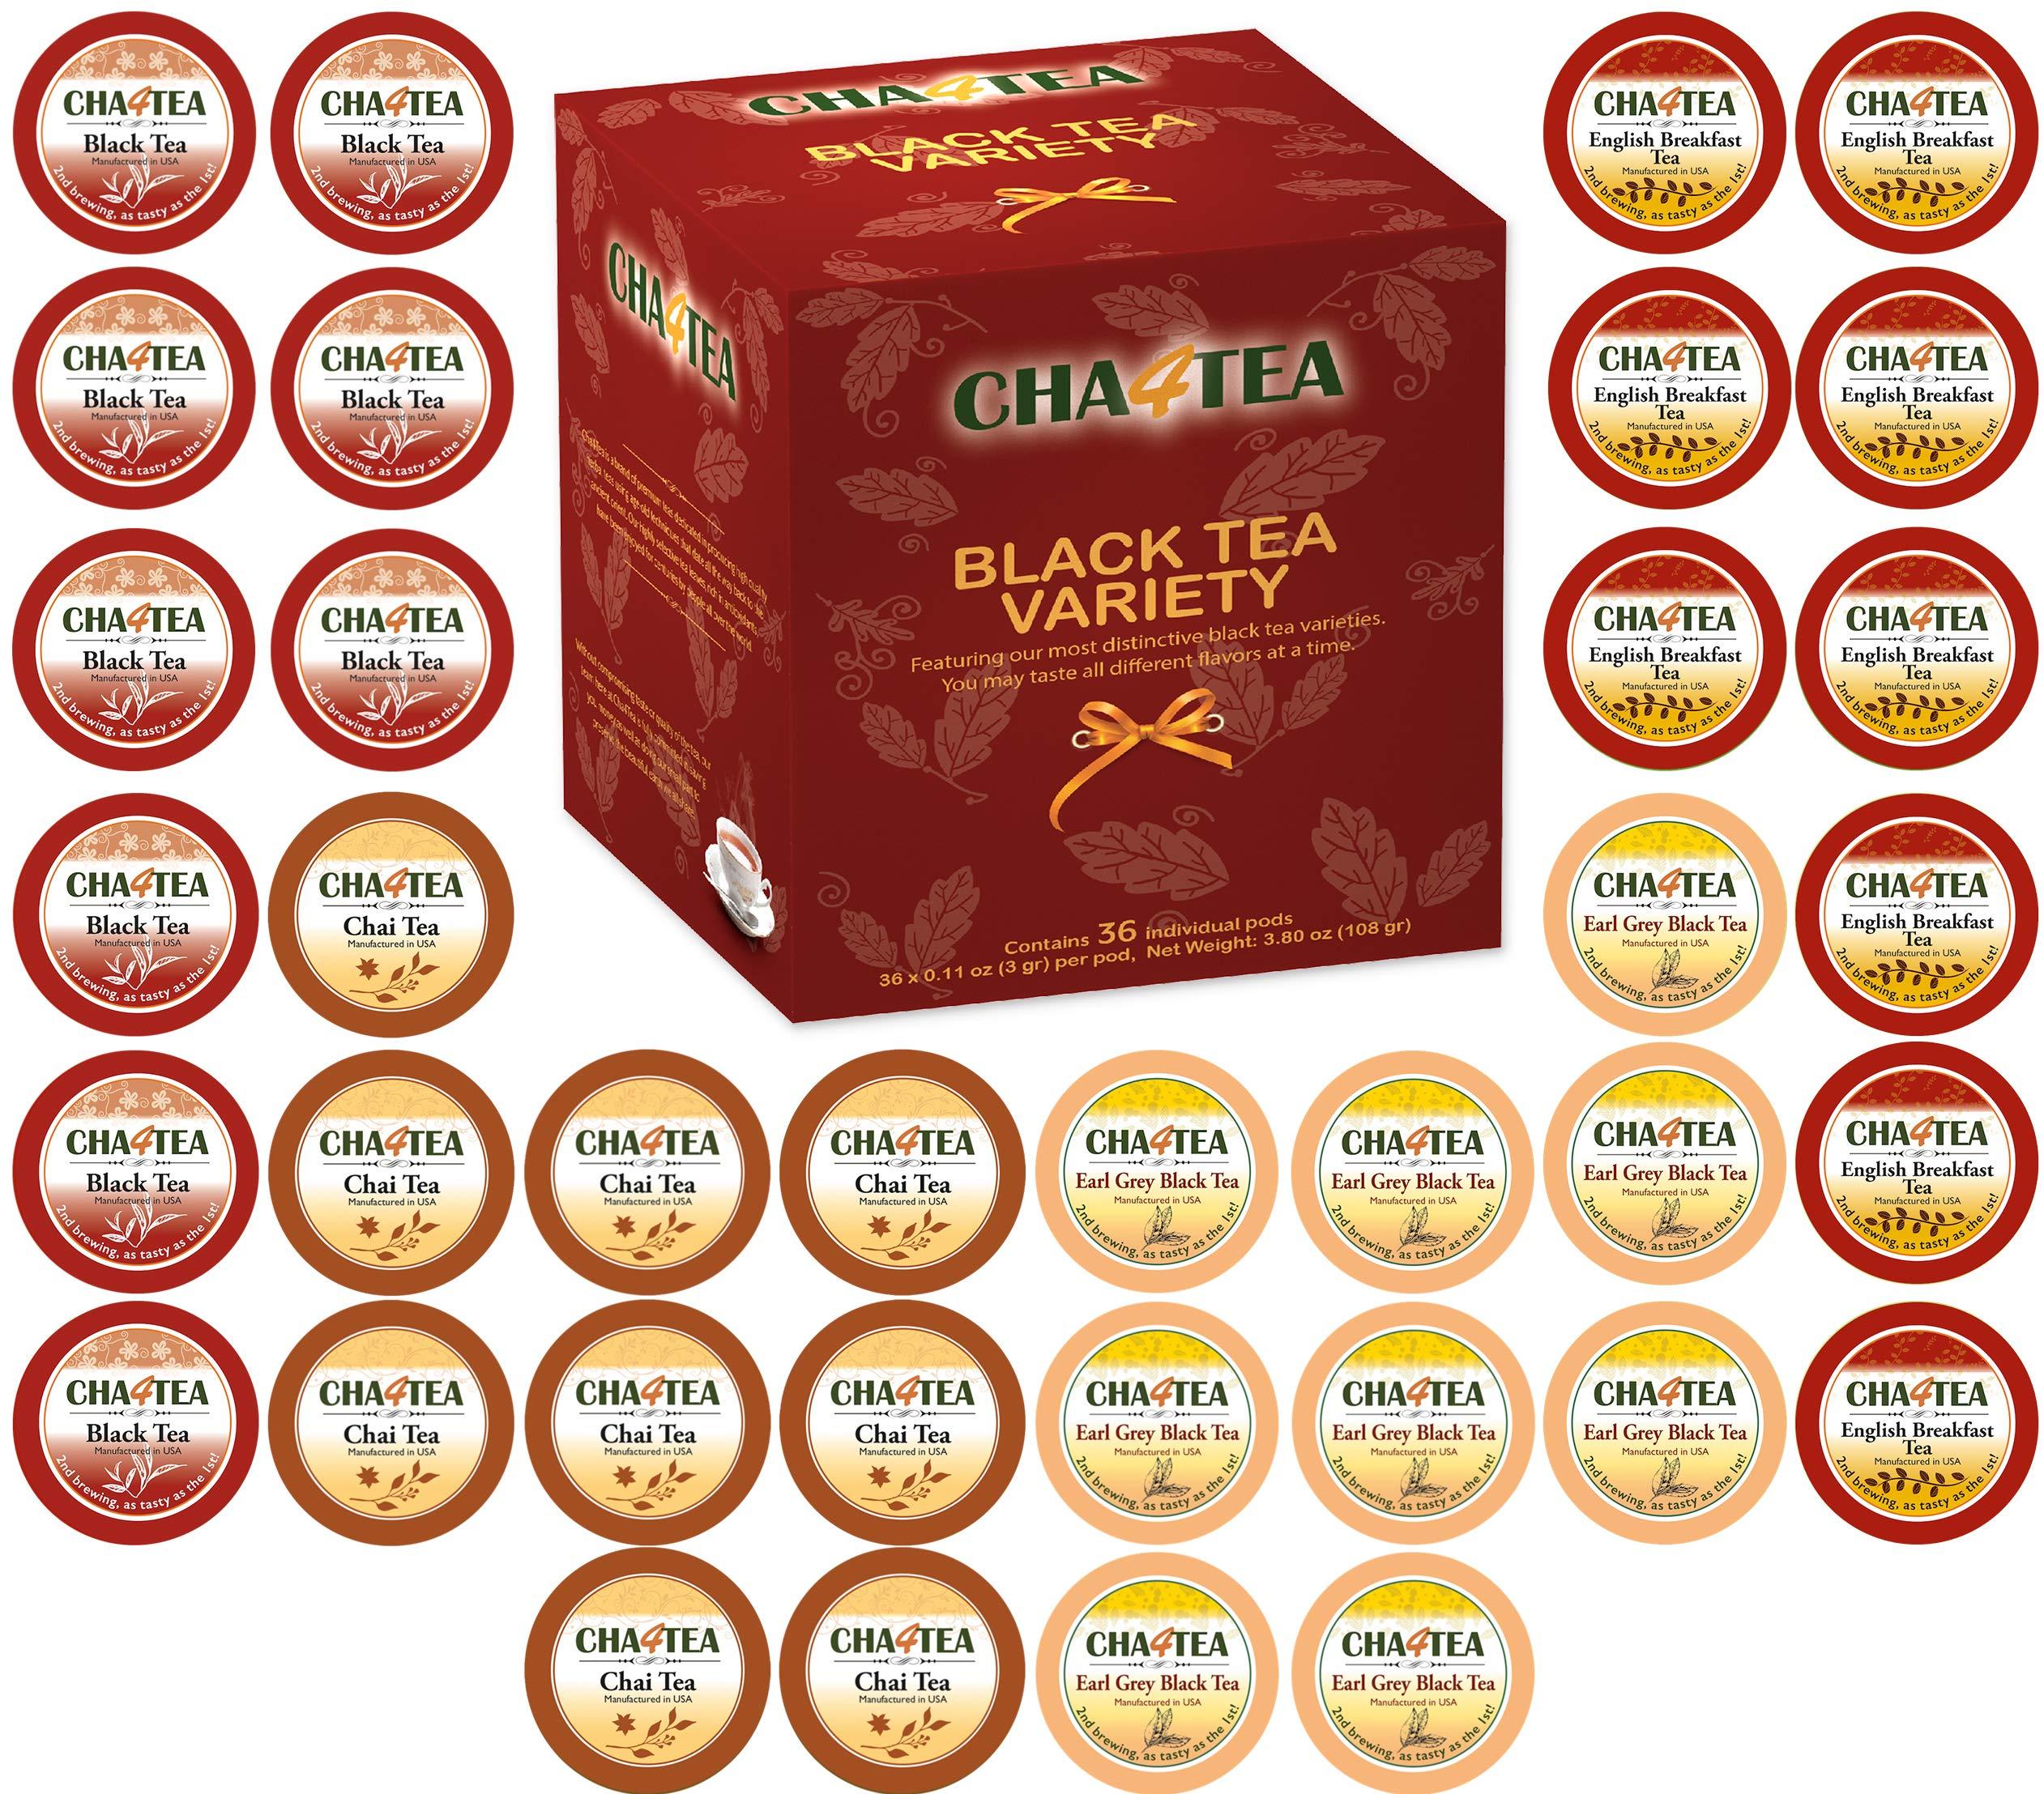 Cha4TEA 36-Count Assorted Black Tea Sampler for Keurig K-Cup Brewers (Black Tea, English Breakfast, Chai Black Tea, Earl Grey) by CHA4TEA